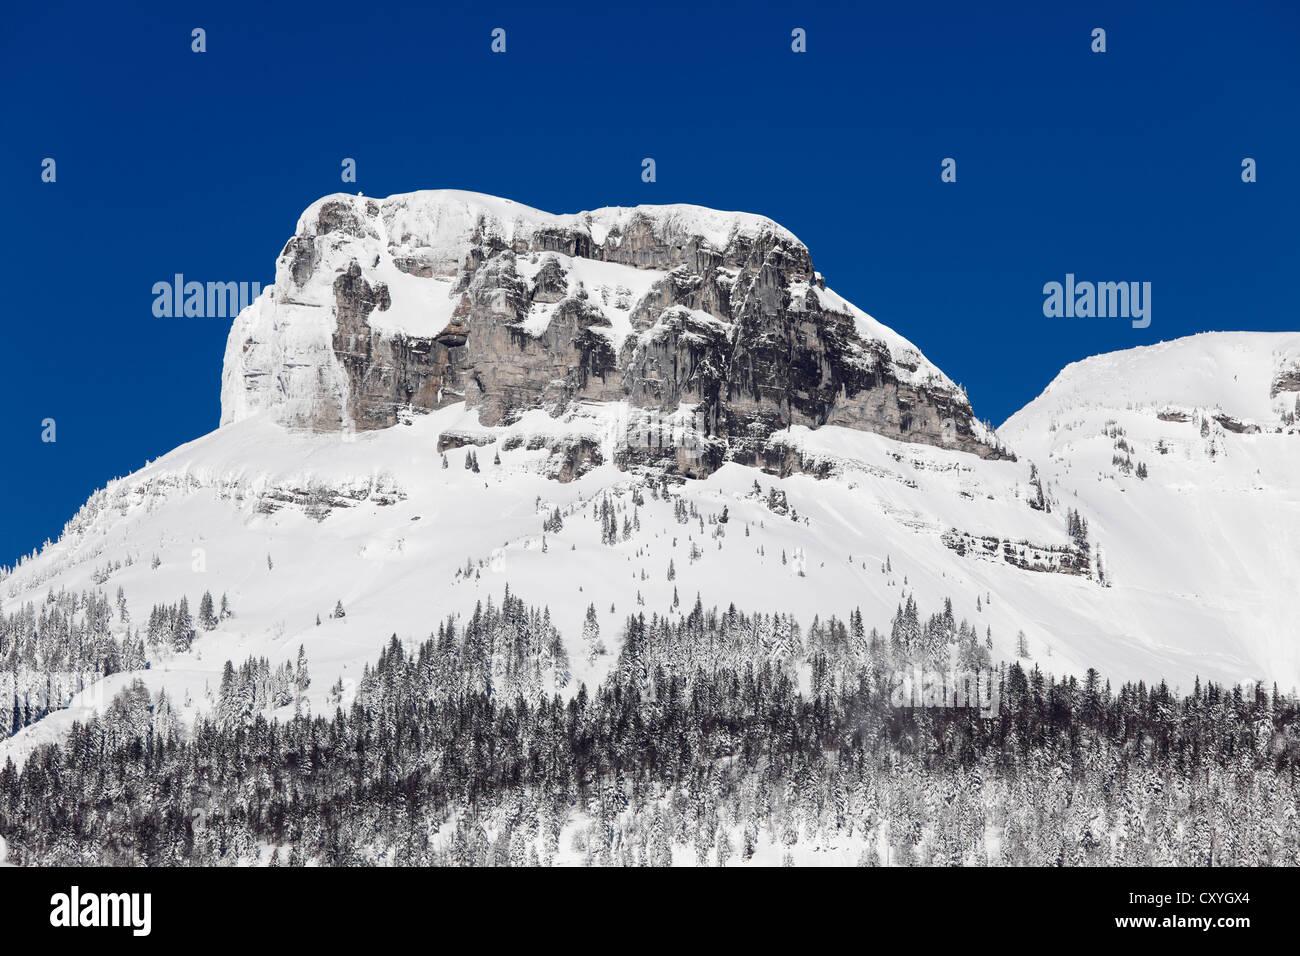 Loser Mountain, Dead Mountains, view from Lake Altaussee, Ausseerland, Salzkammergut, Styria, Austria, Europe - Stock Image